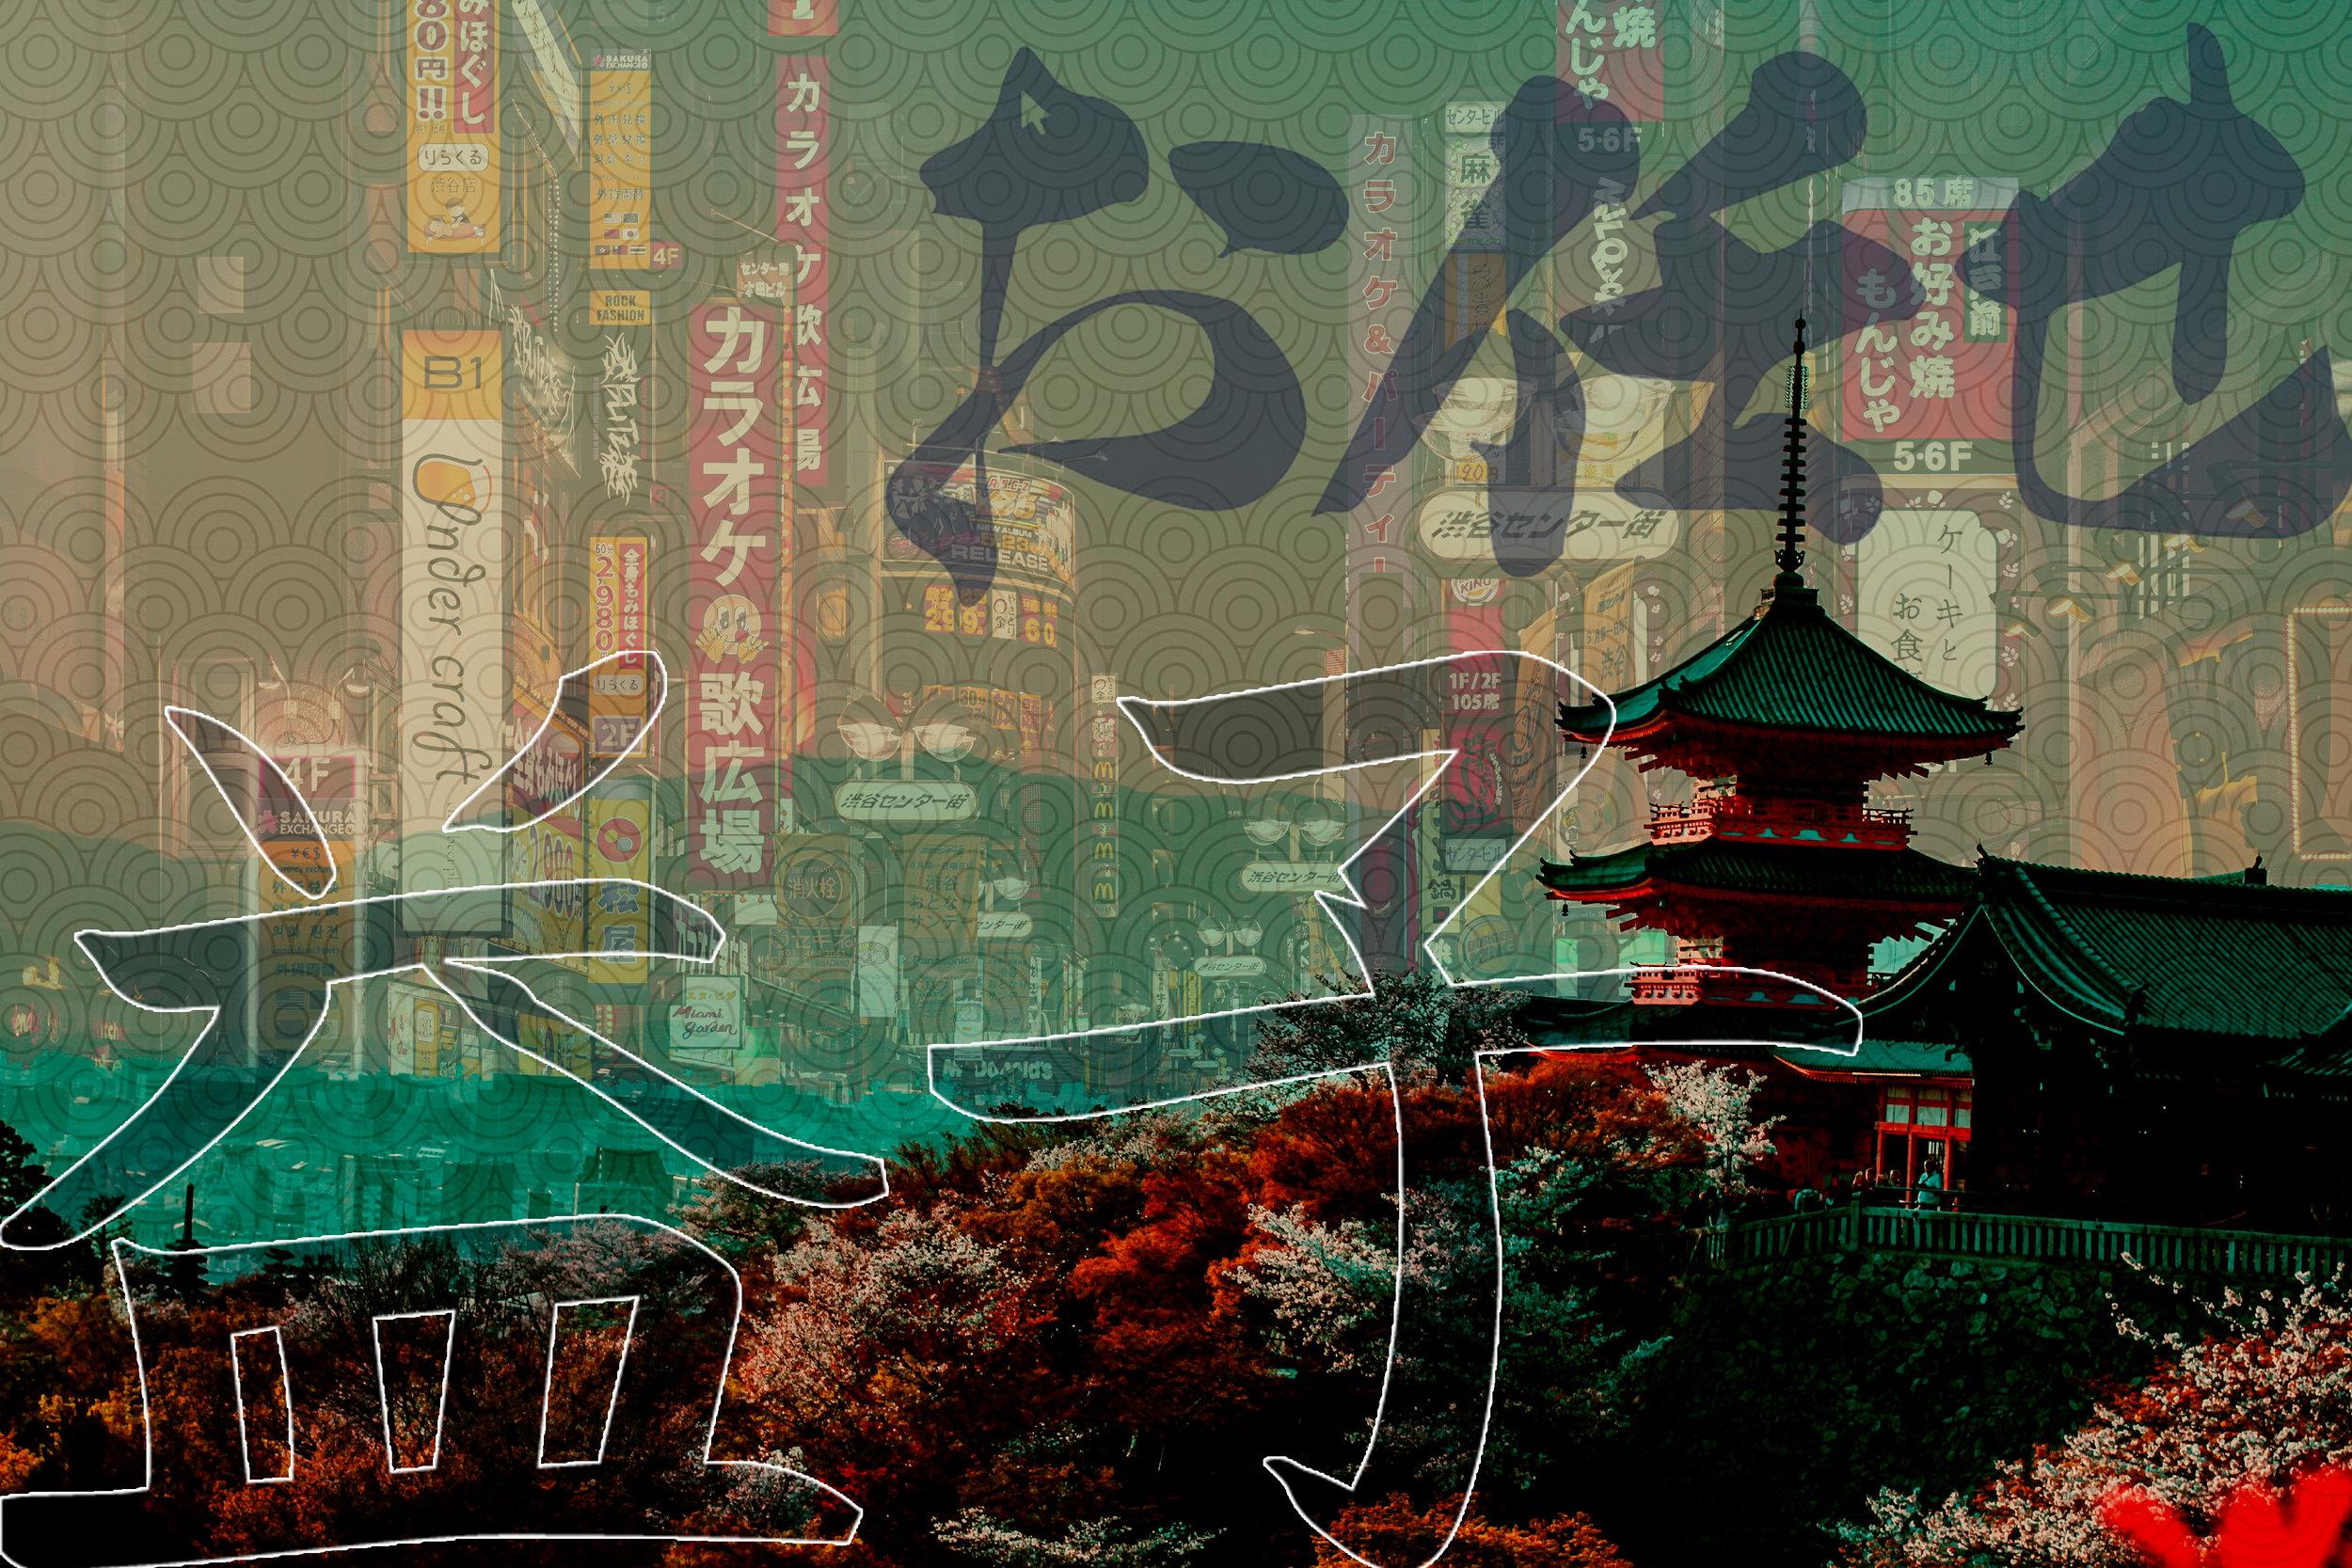 Illustration concept for Mashiko Restaurant